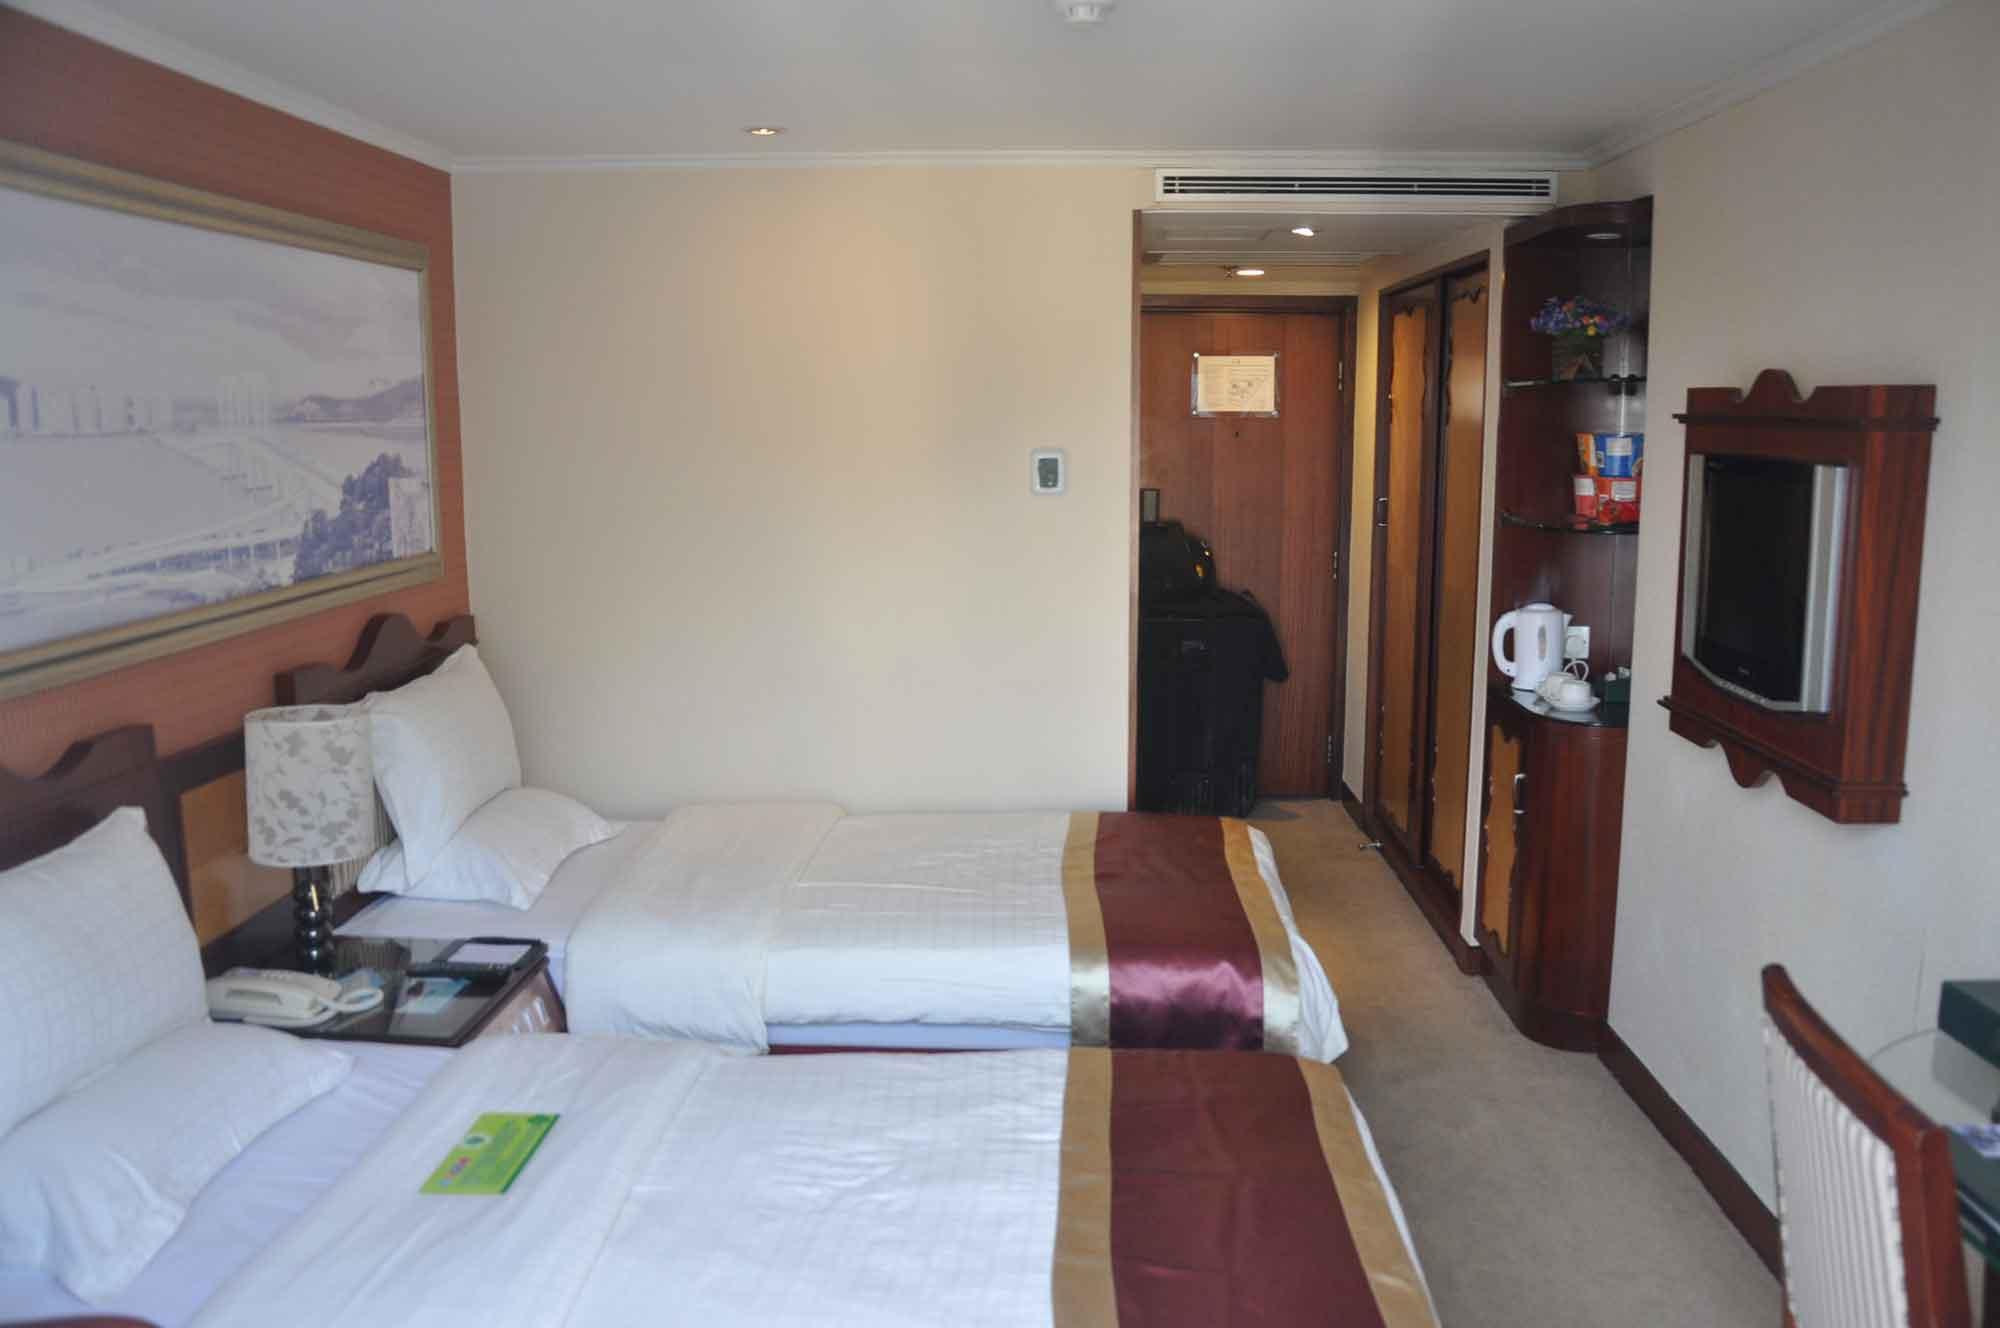 Standard Twin Room Hotel Guia Macau two beds